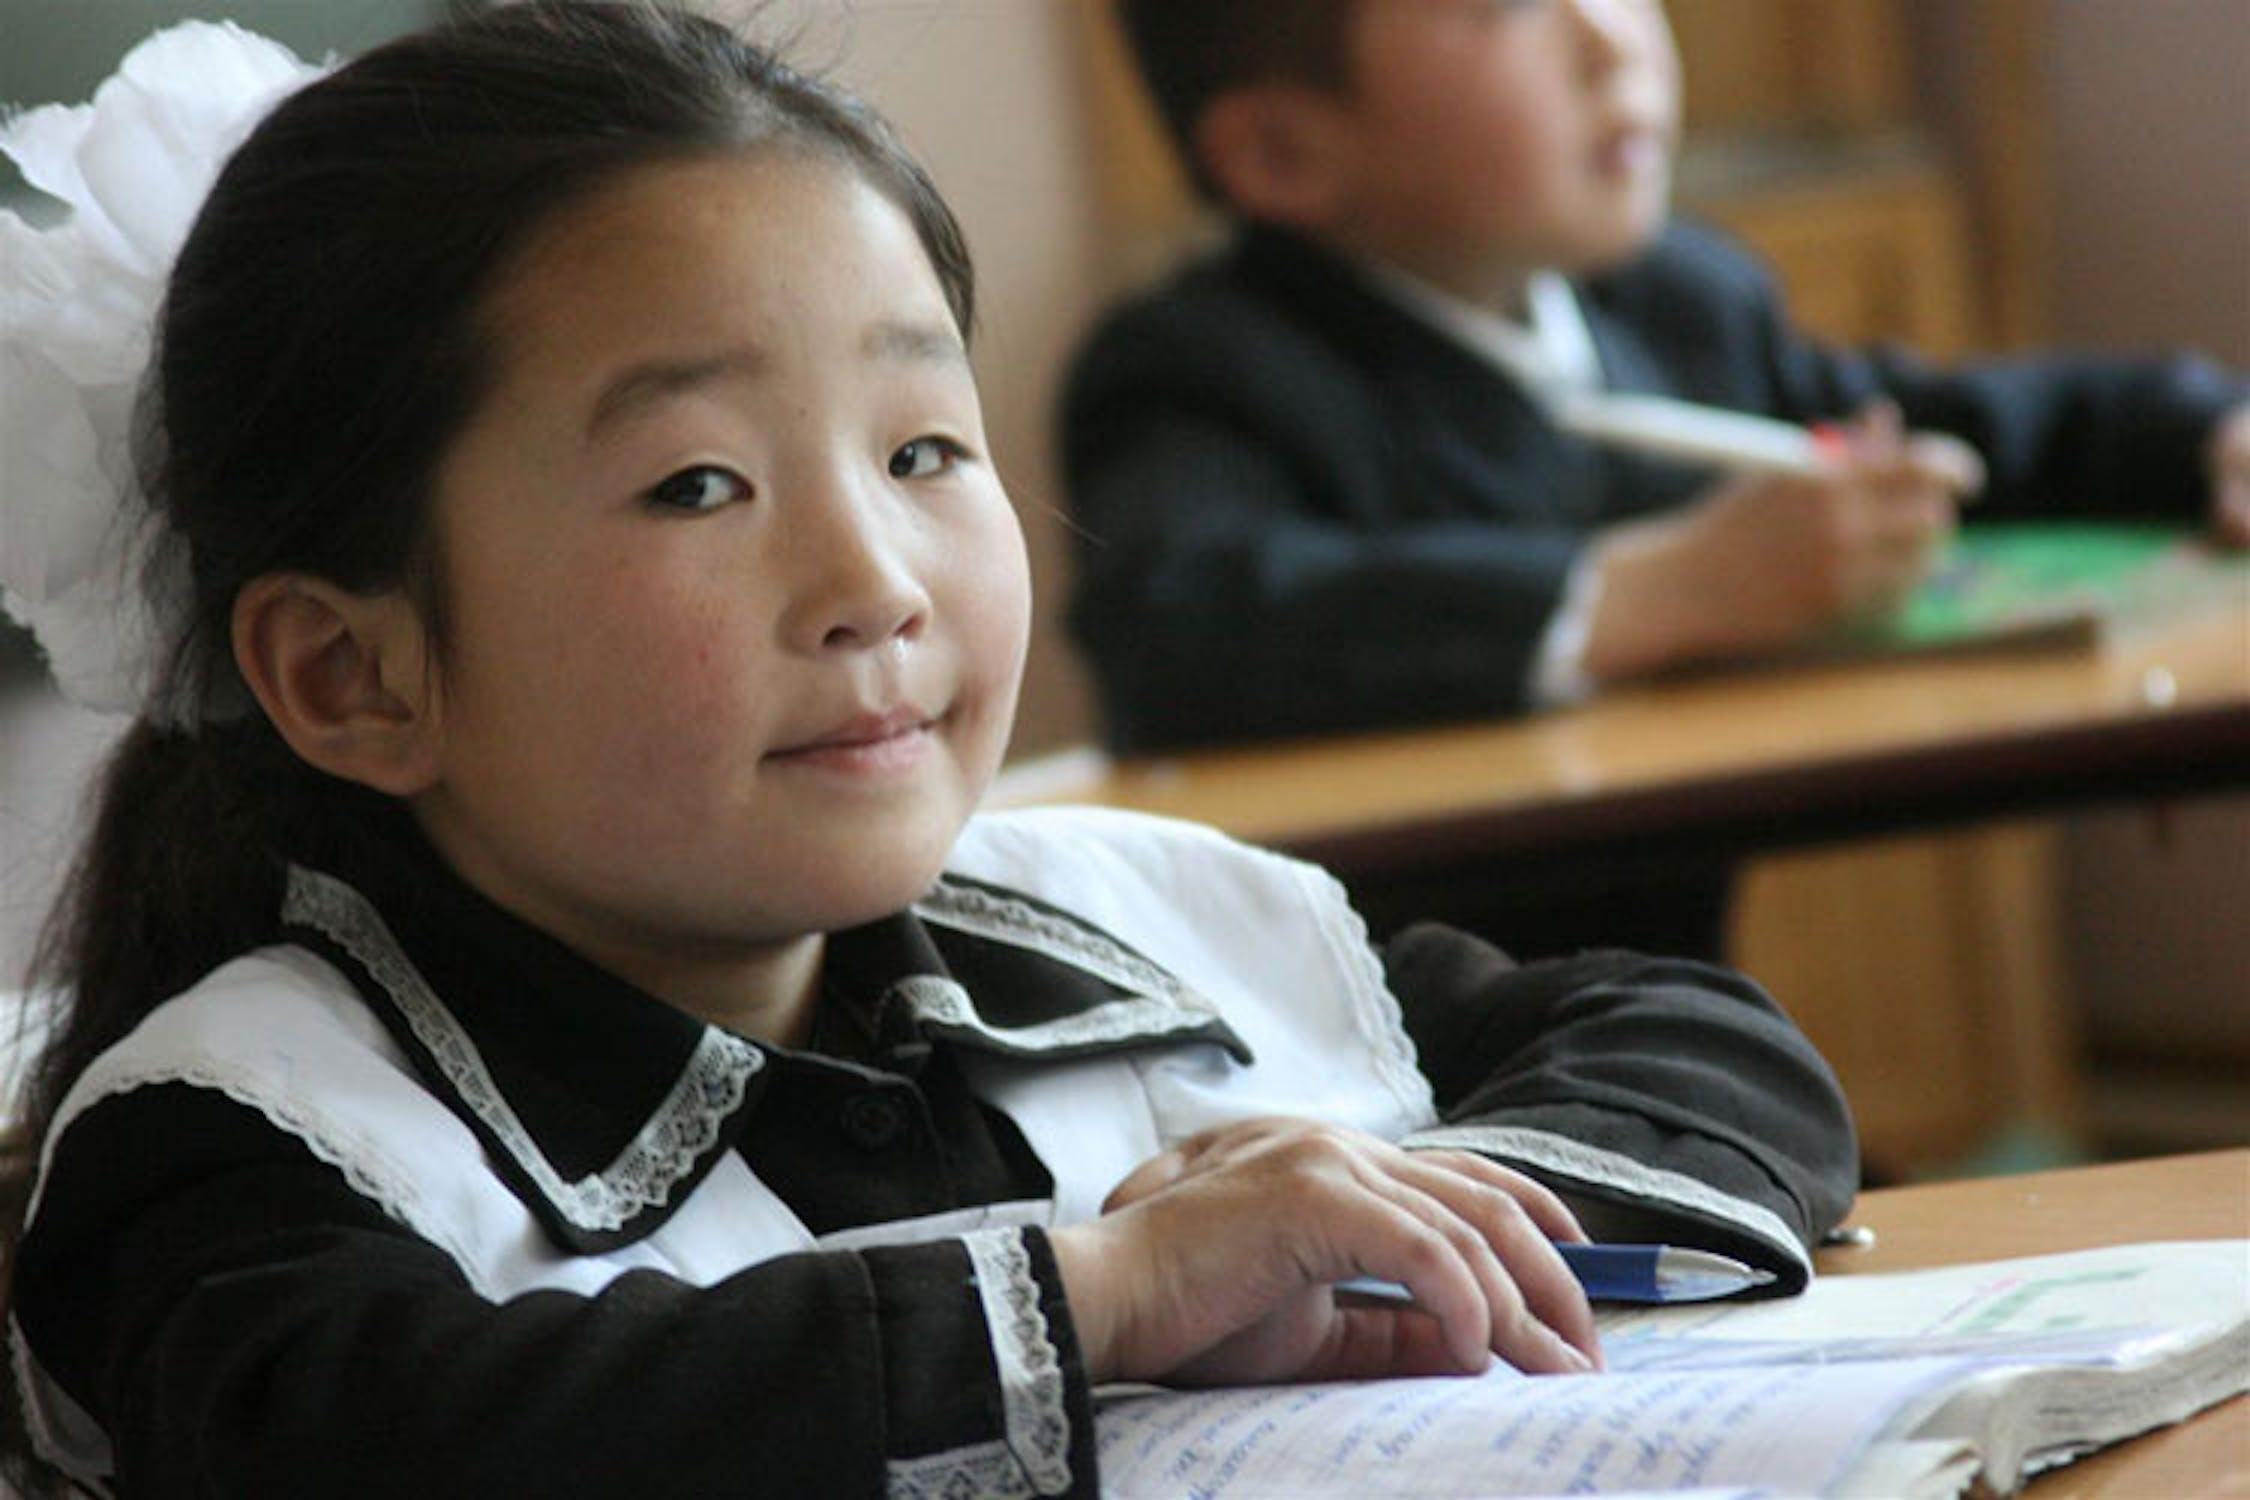 ©UNICEF Mongolia/2008-0021/Zet